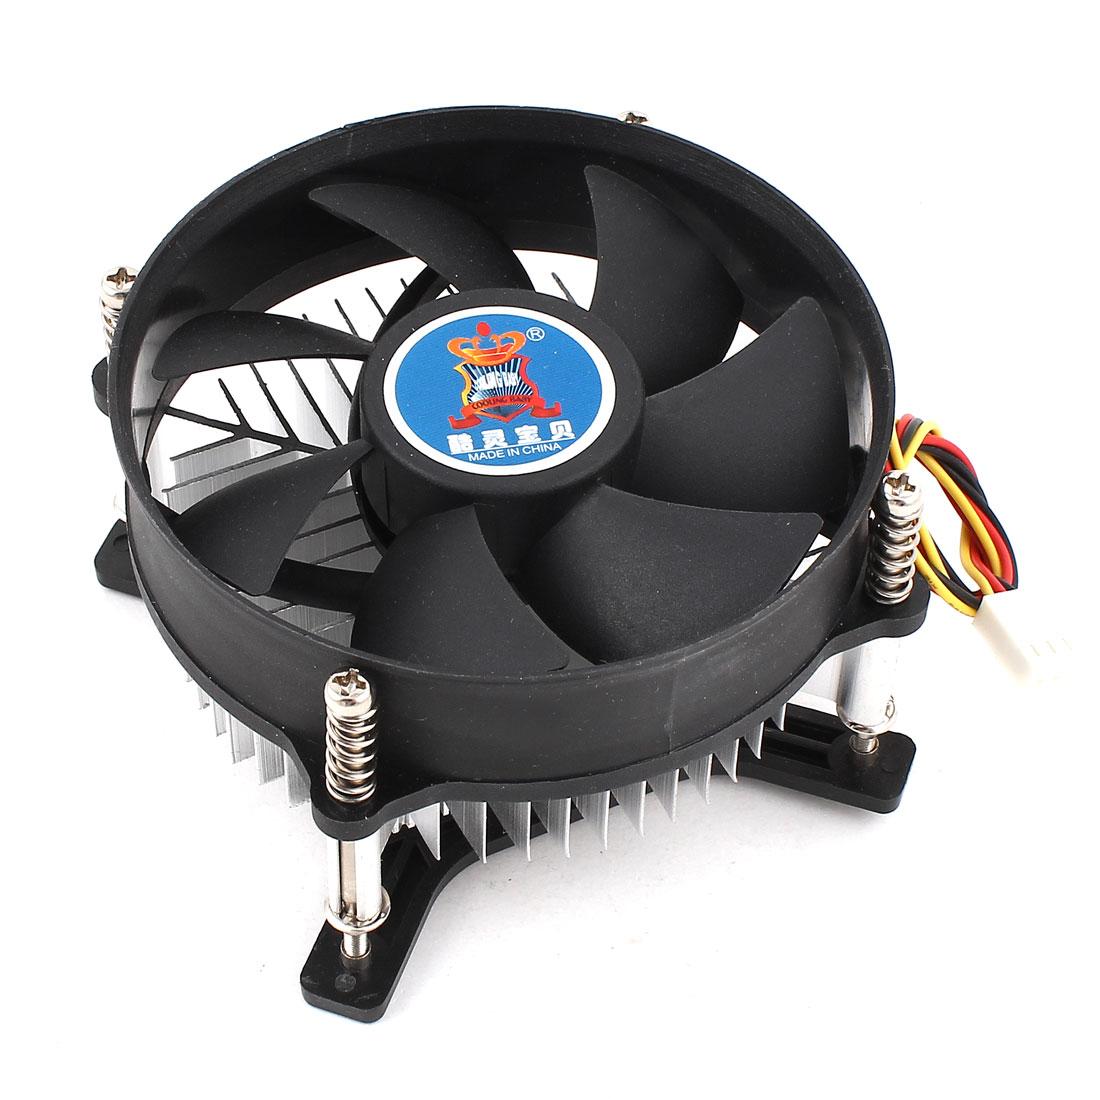 Desktop PC Cooling Fan CPU Heatsink Cooler 3Pole 12V for Intel LGA775